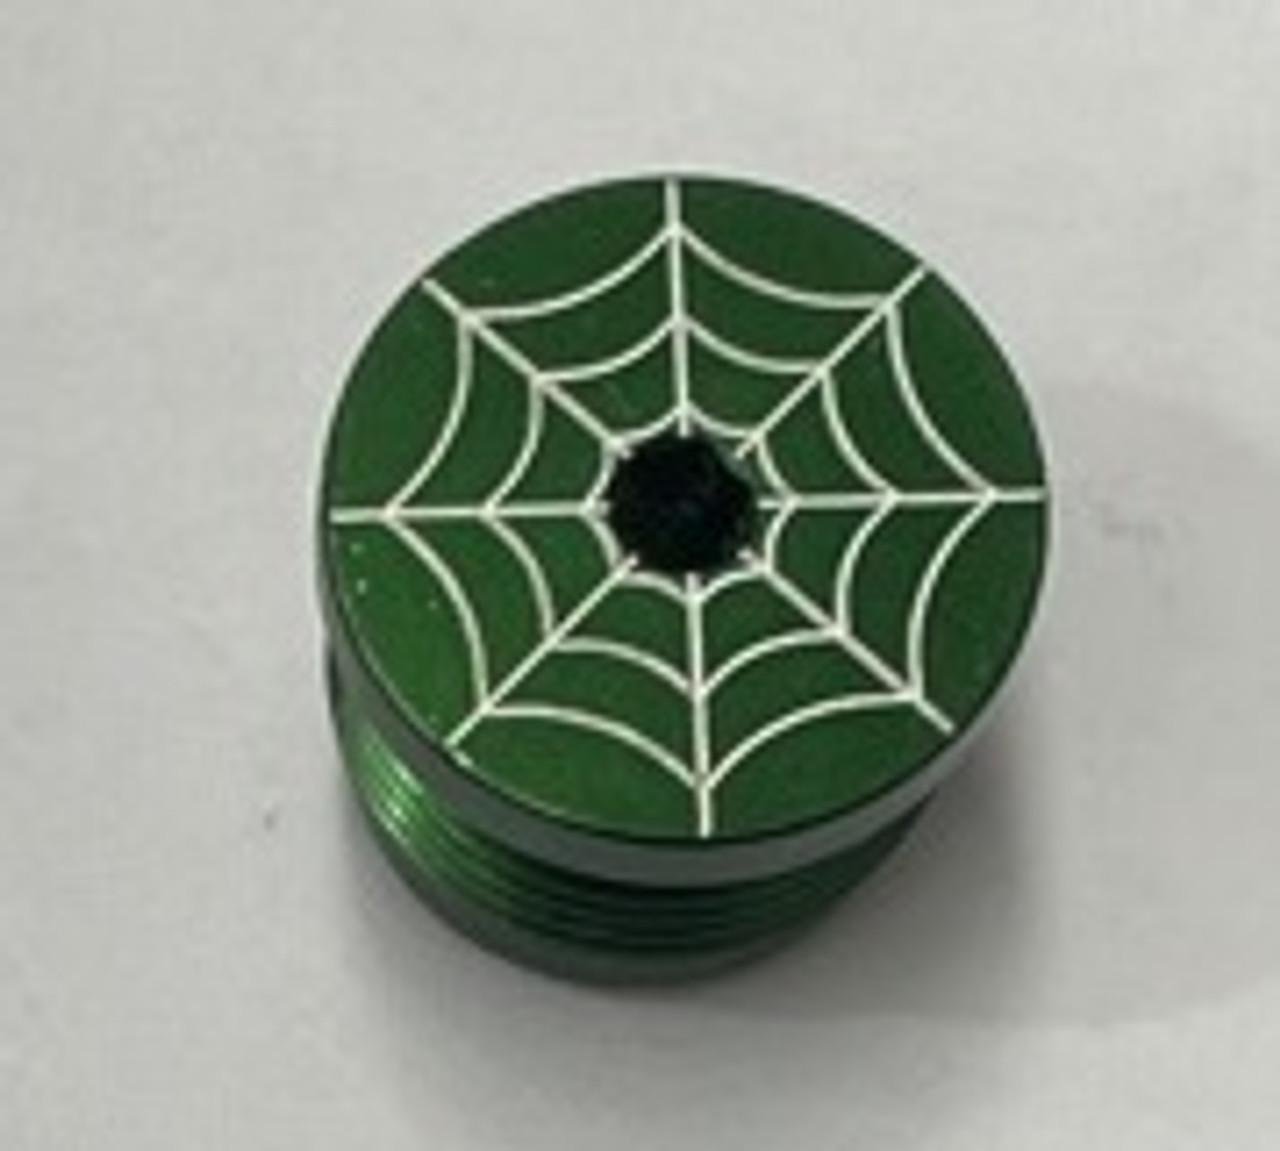 New Designz - Impulse - Hammer Cap - Web - Green